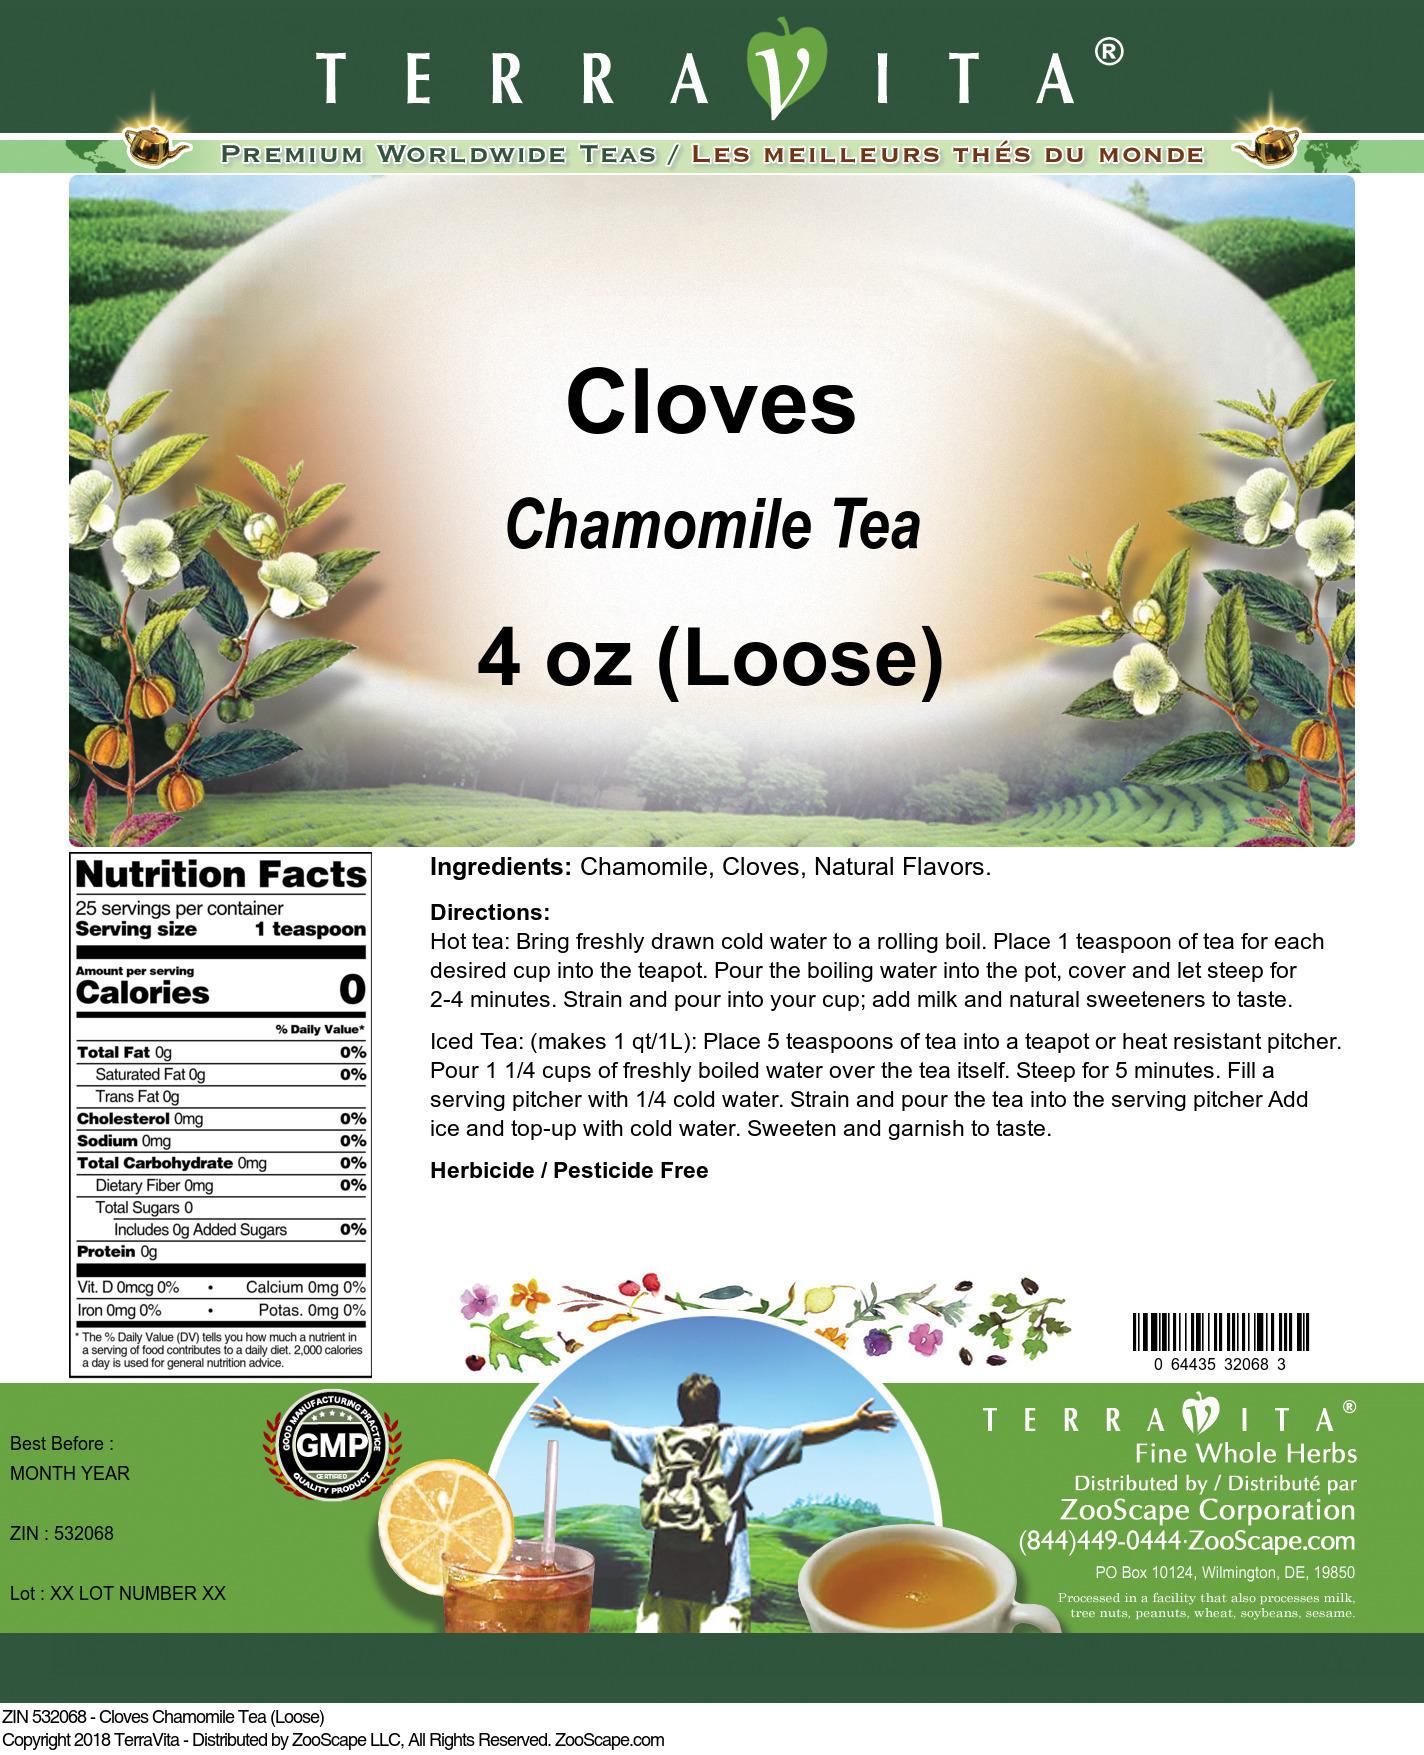 Cloves Chamomile Tea